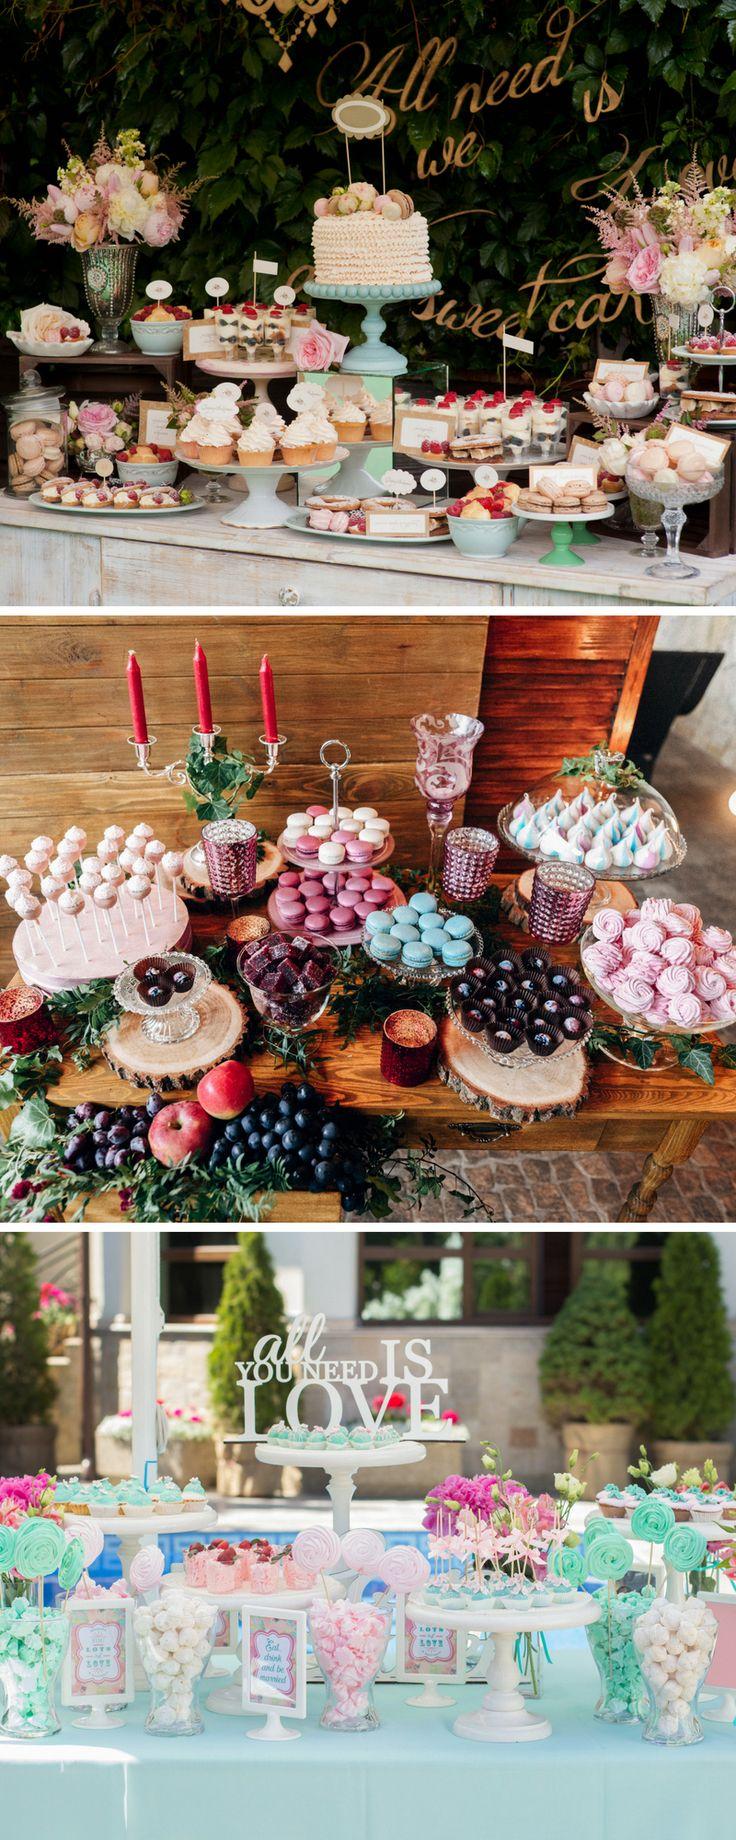 hochzeitsbar  hochzeit bar ideen  weddingbar  candy bar